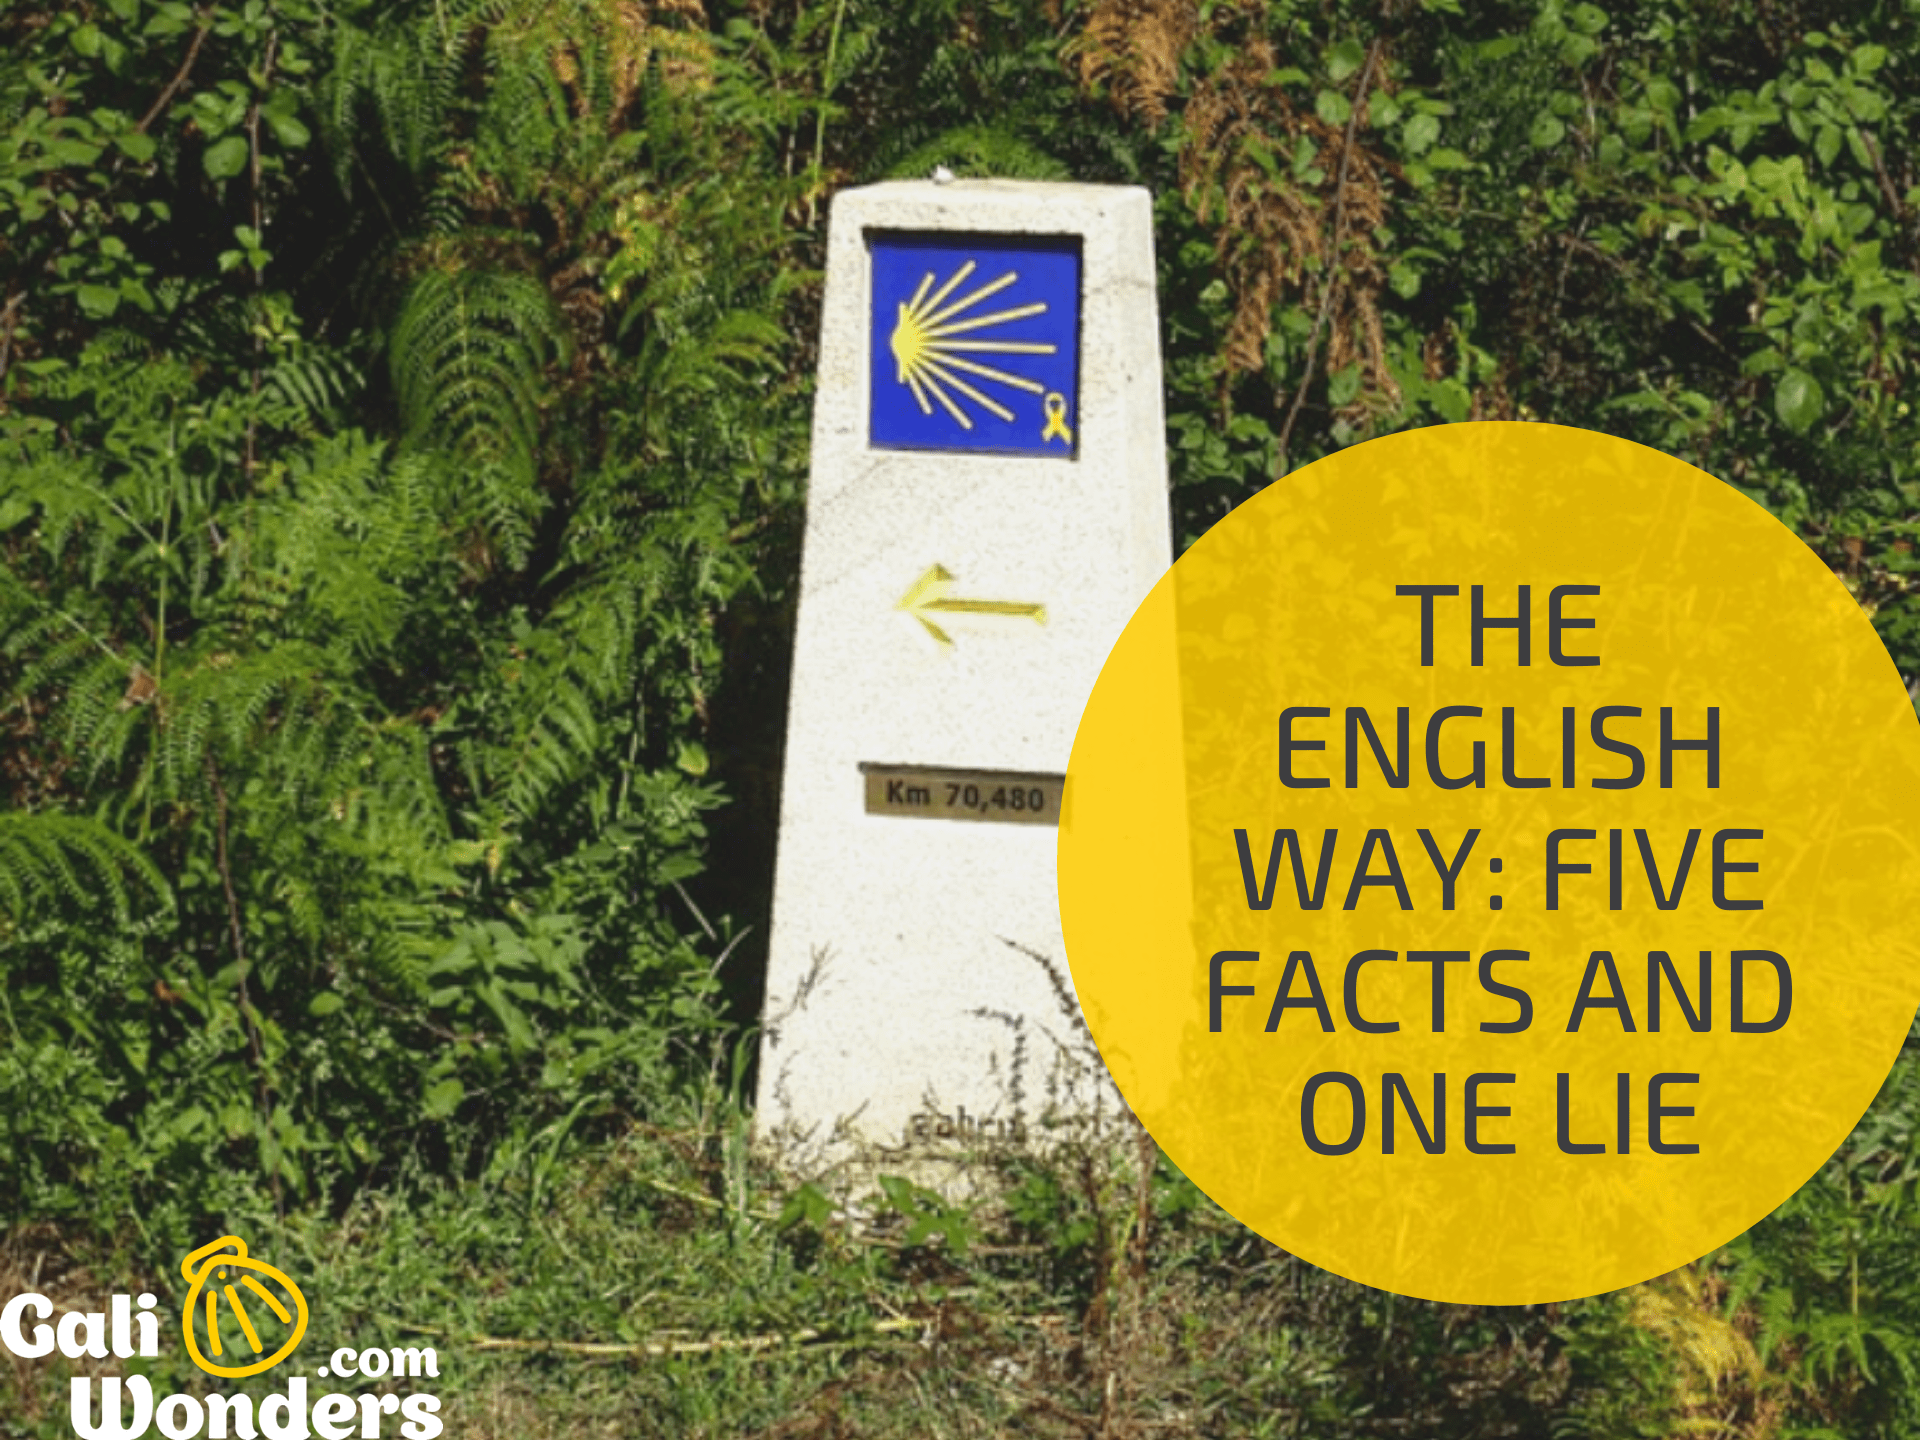 English Way lies